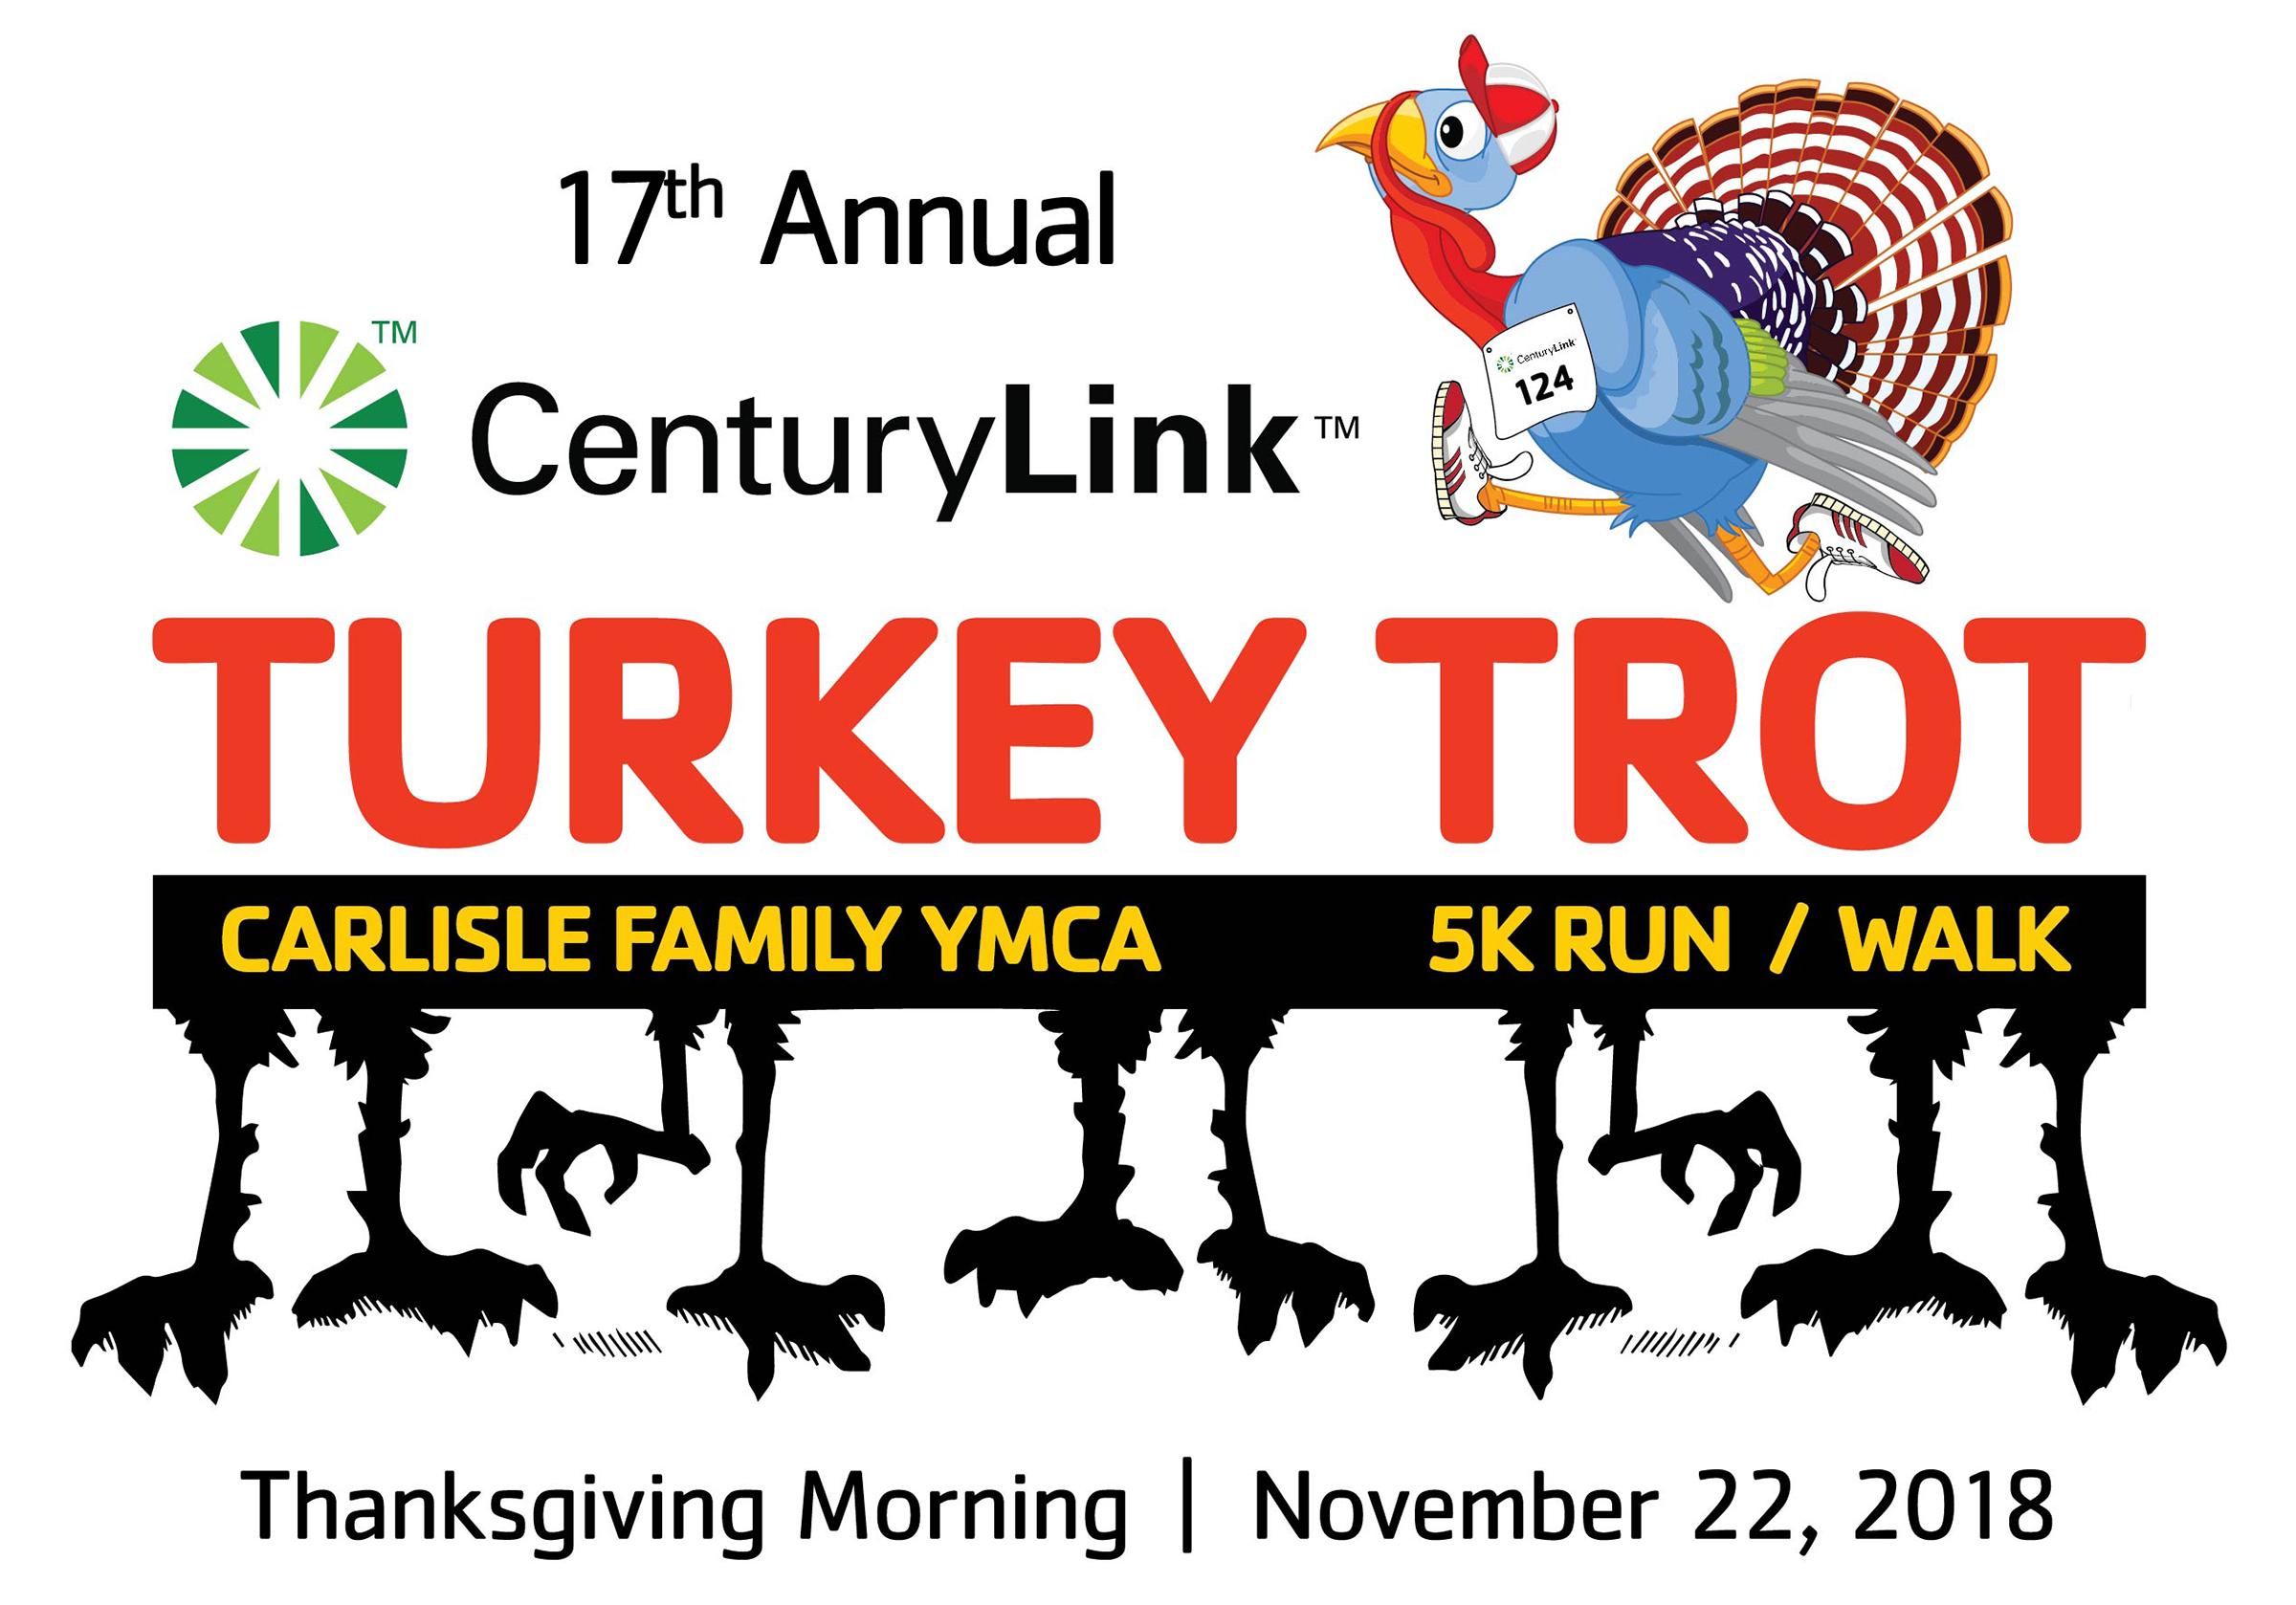 centurylink-turkey-trot-sponsor